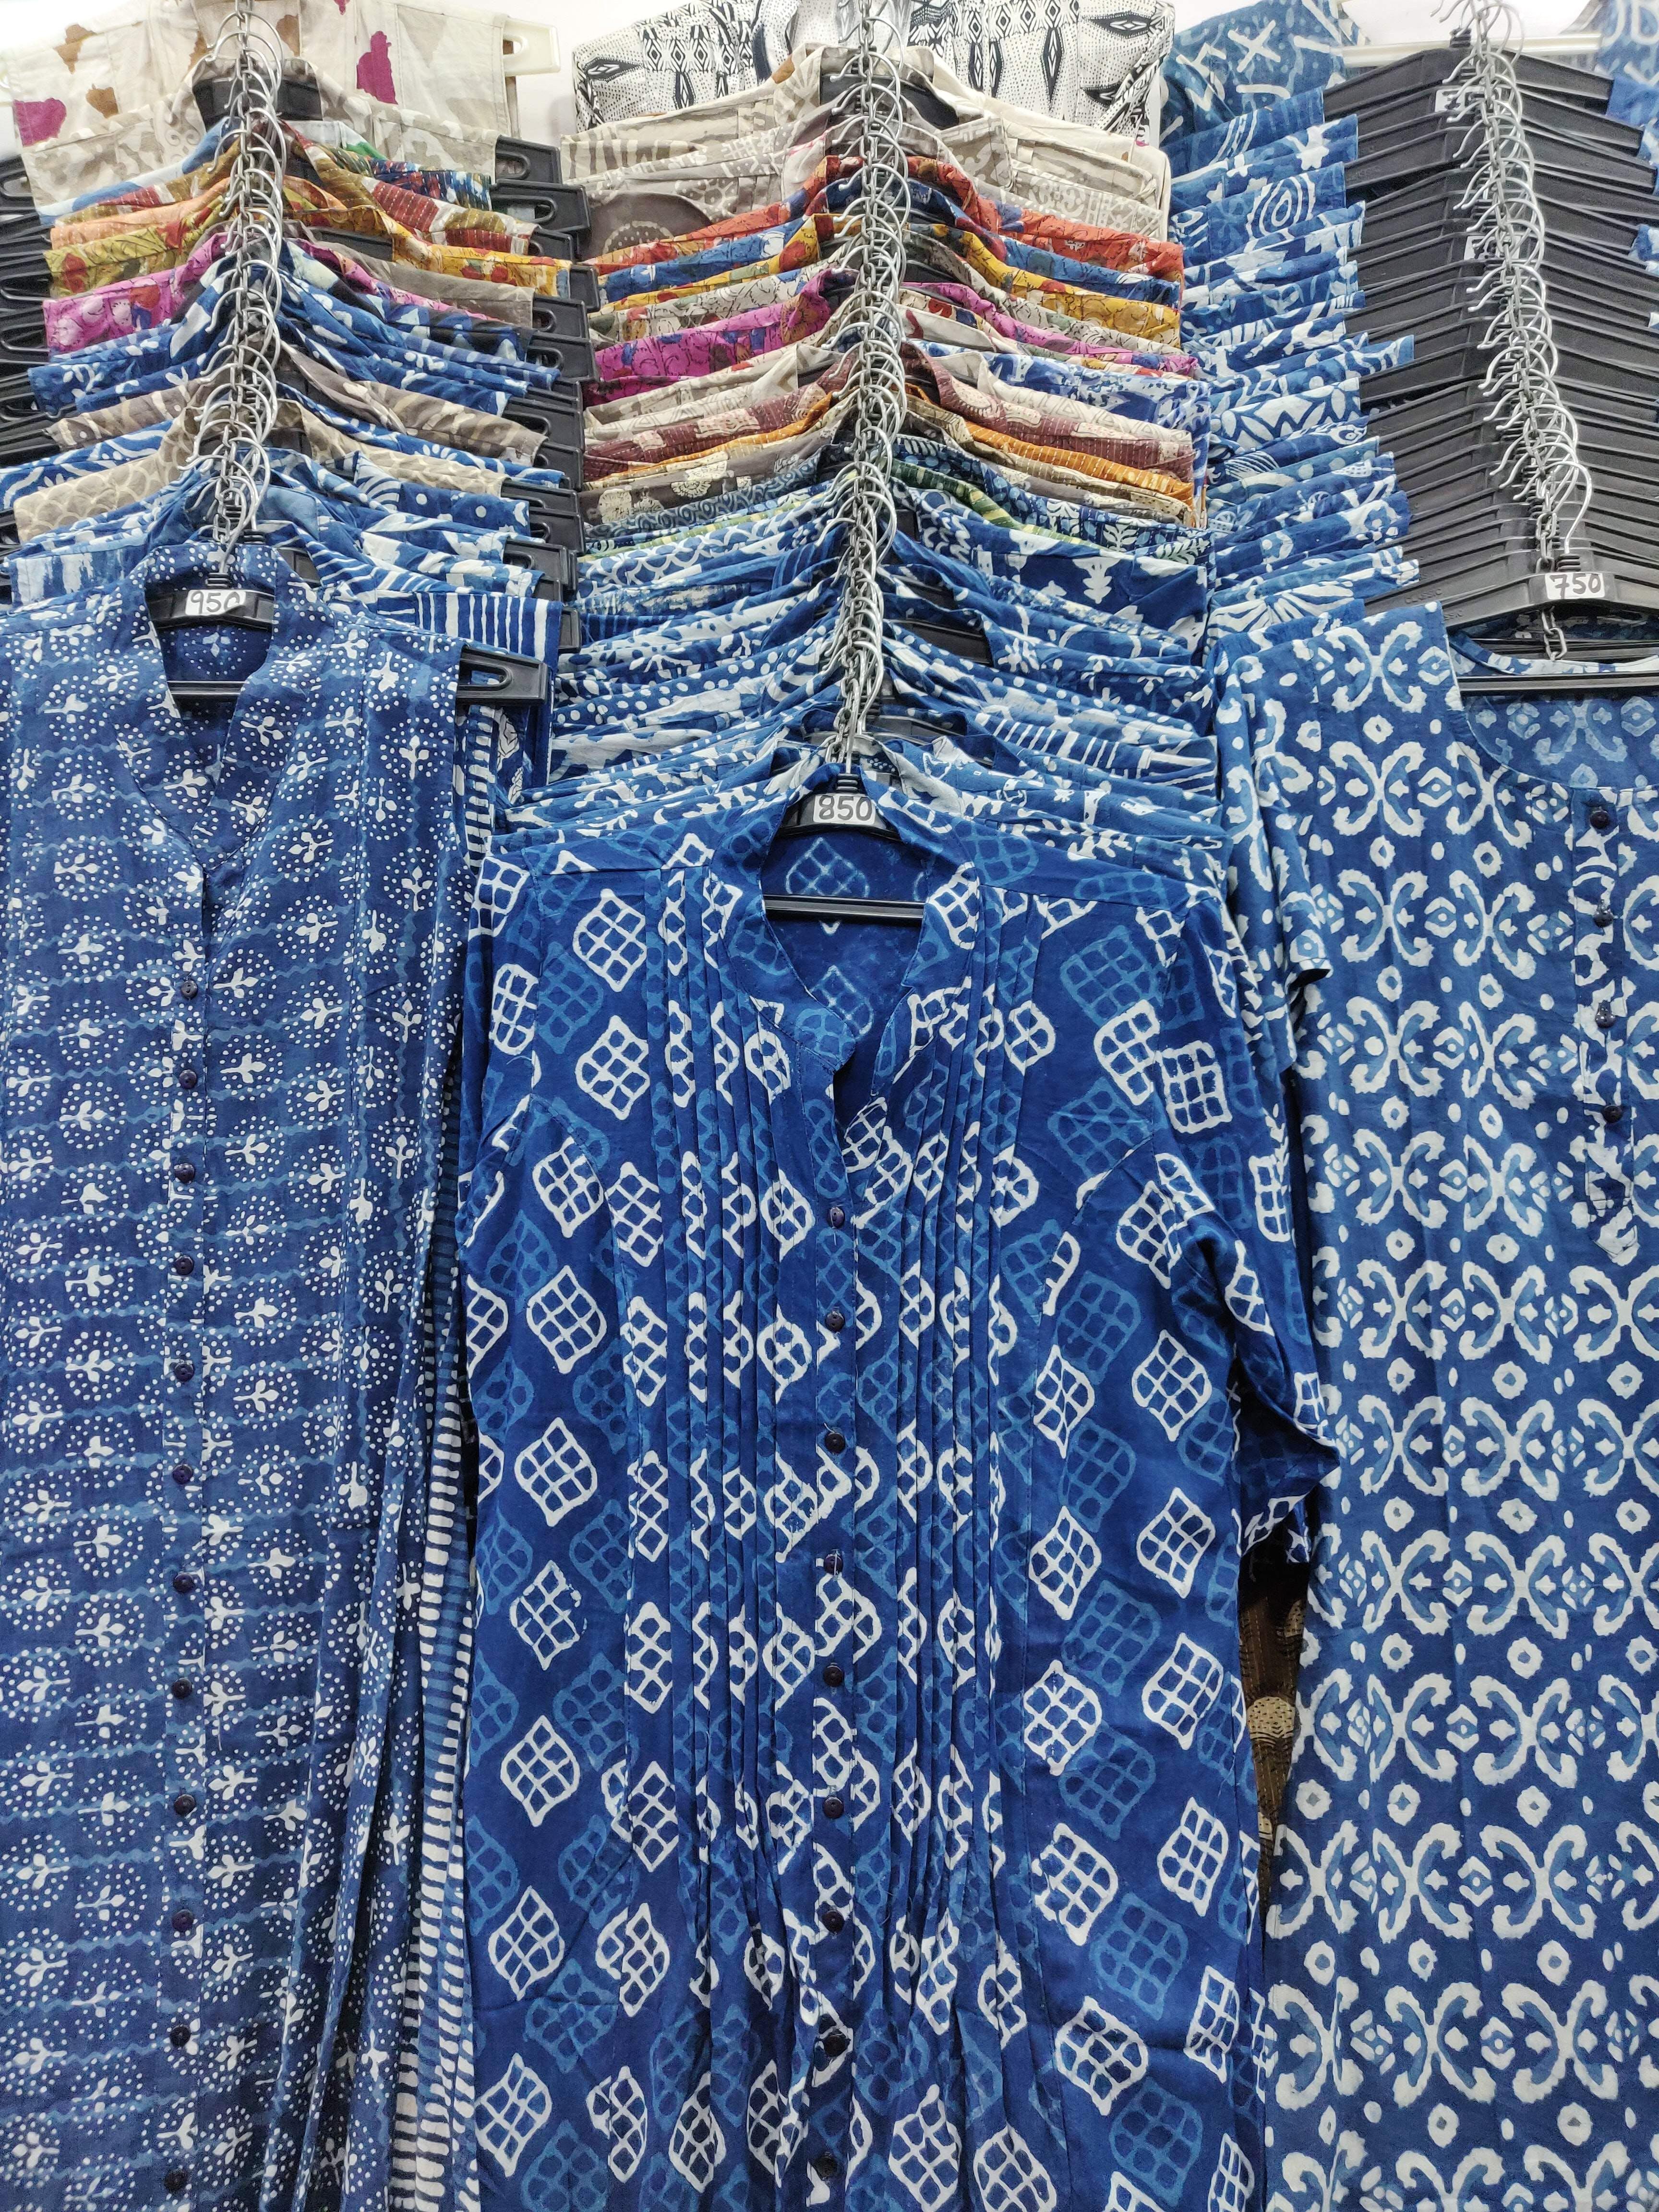 Clothing,Blue,Denim,Jeans,Pocket,Cobalt blue,Textile,Woven fabric,Pattern,Dress